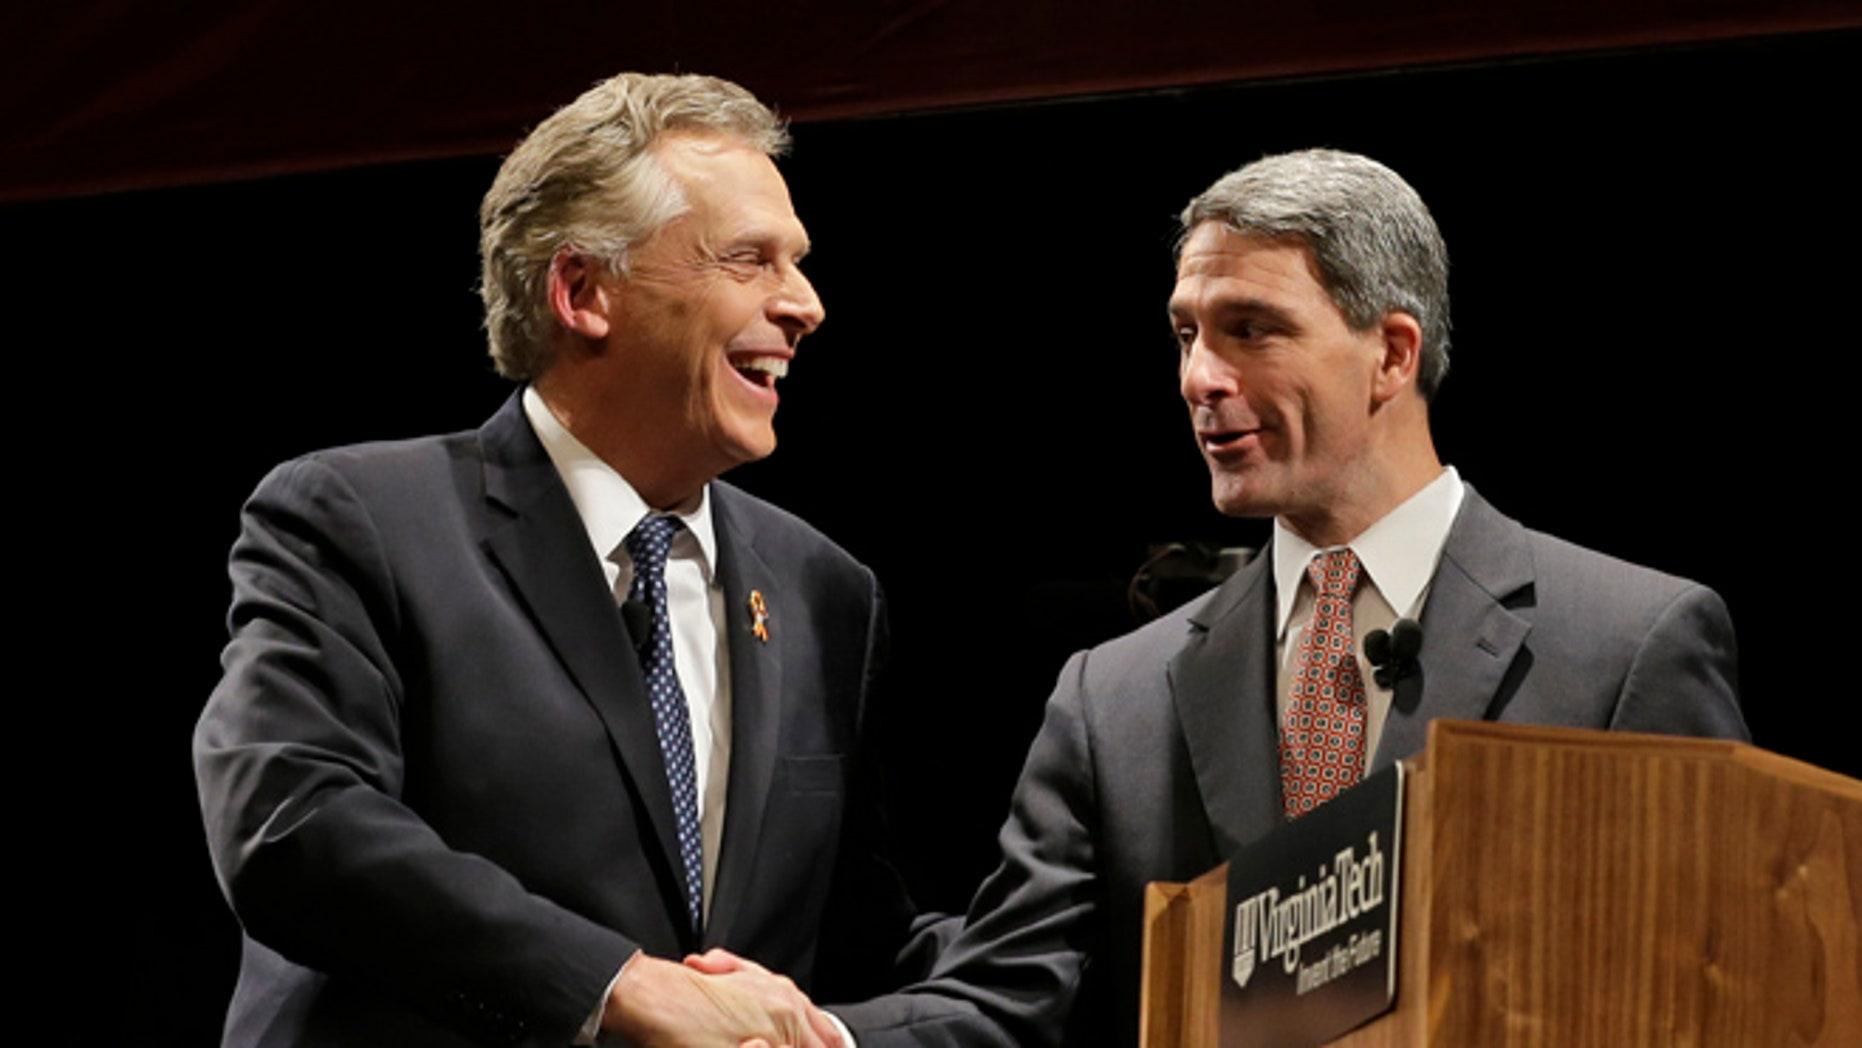 FILE: Oct. 24, 2013: Democratic gubernatorial candidate Terry McAuliffe, left, shakes hands with Republican challenger Virginia Attorney General Ken Cuccinelli at a debate at Virginia Tech in Blacksburg, Va.